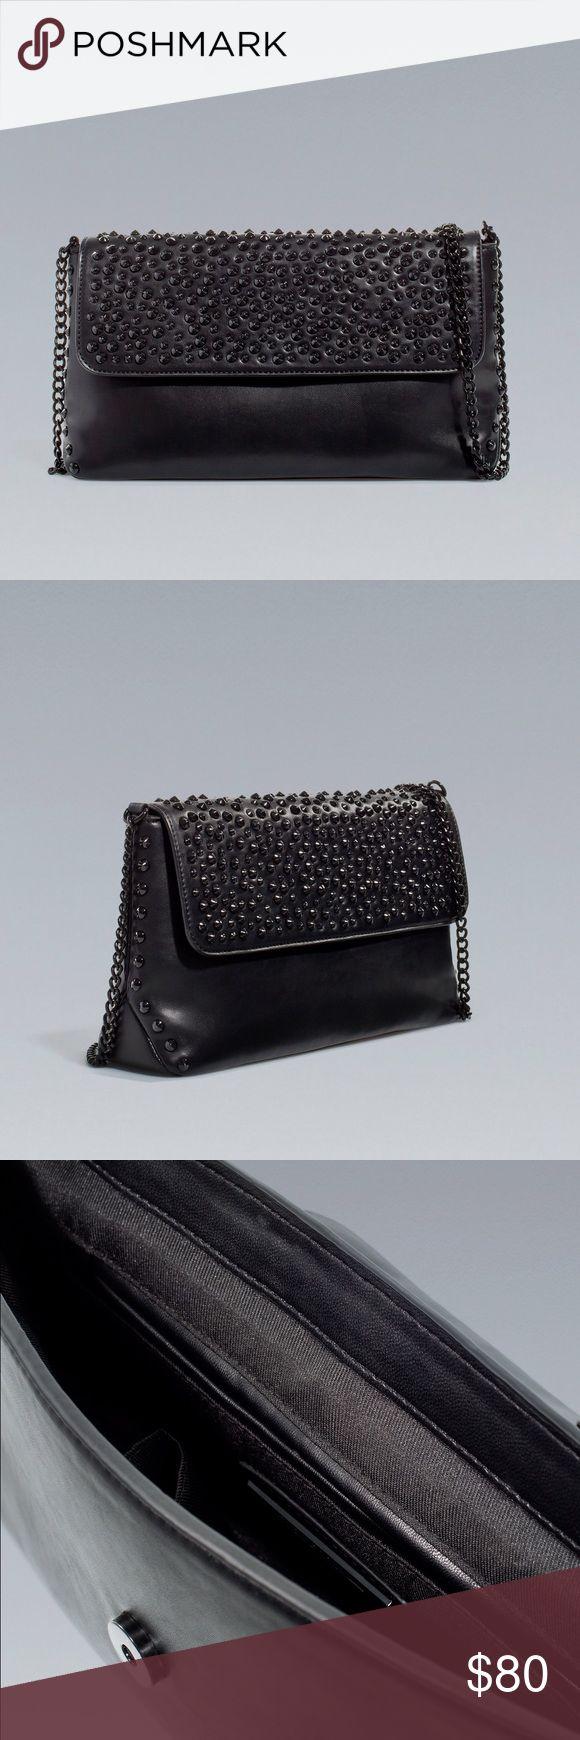 RARE Zara Black Studded Bag Zara black studded bag. Pre-loved but in great condition.‼️ Cheaper on Mercari or PayPal Zara Bags Crossbody Bags